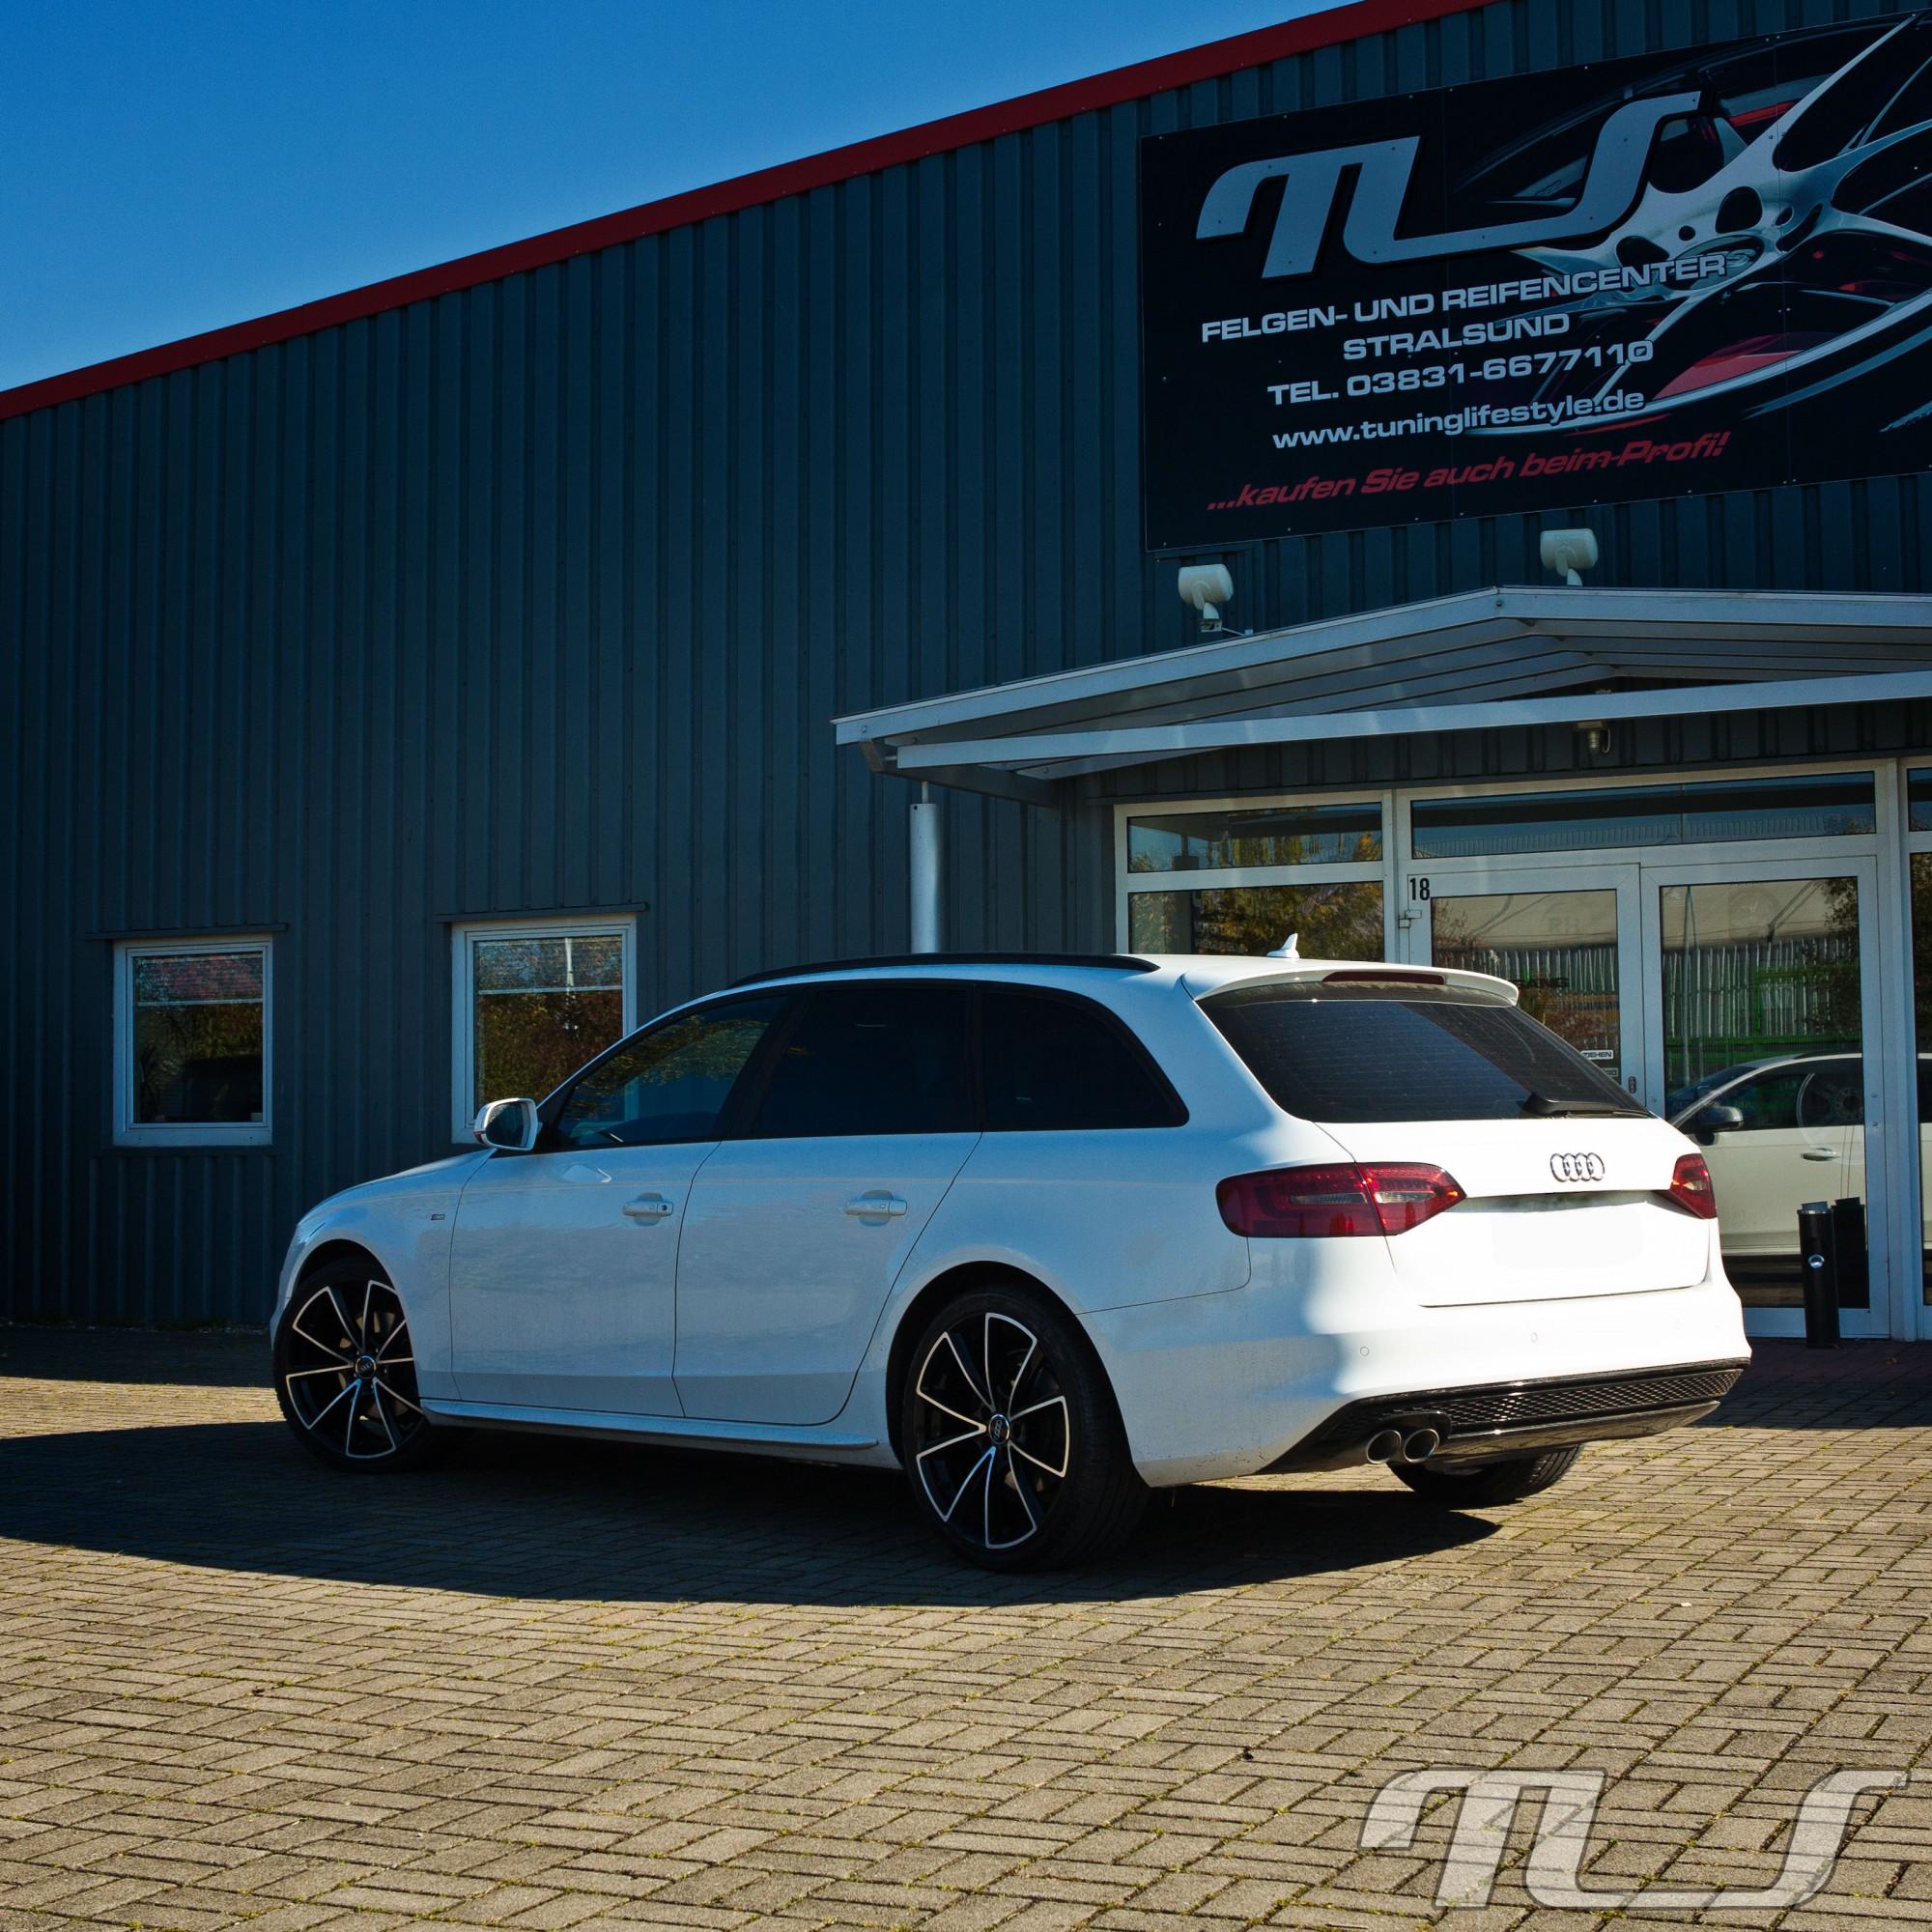 19 Zoll Alufelgen F 252 R Audi A4 A5 S5 A6 S6 A7 S7 Q3 Q5 Mam